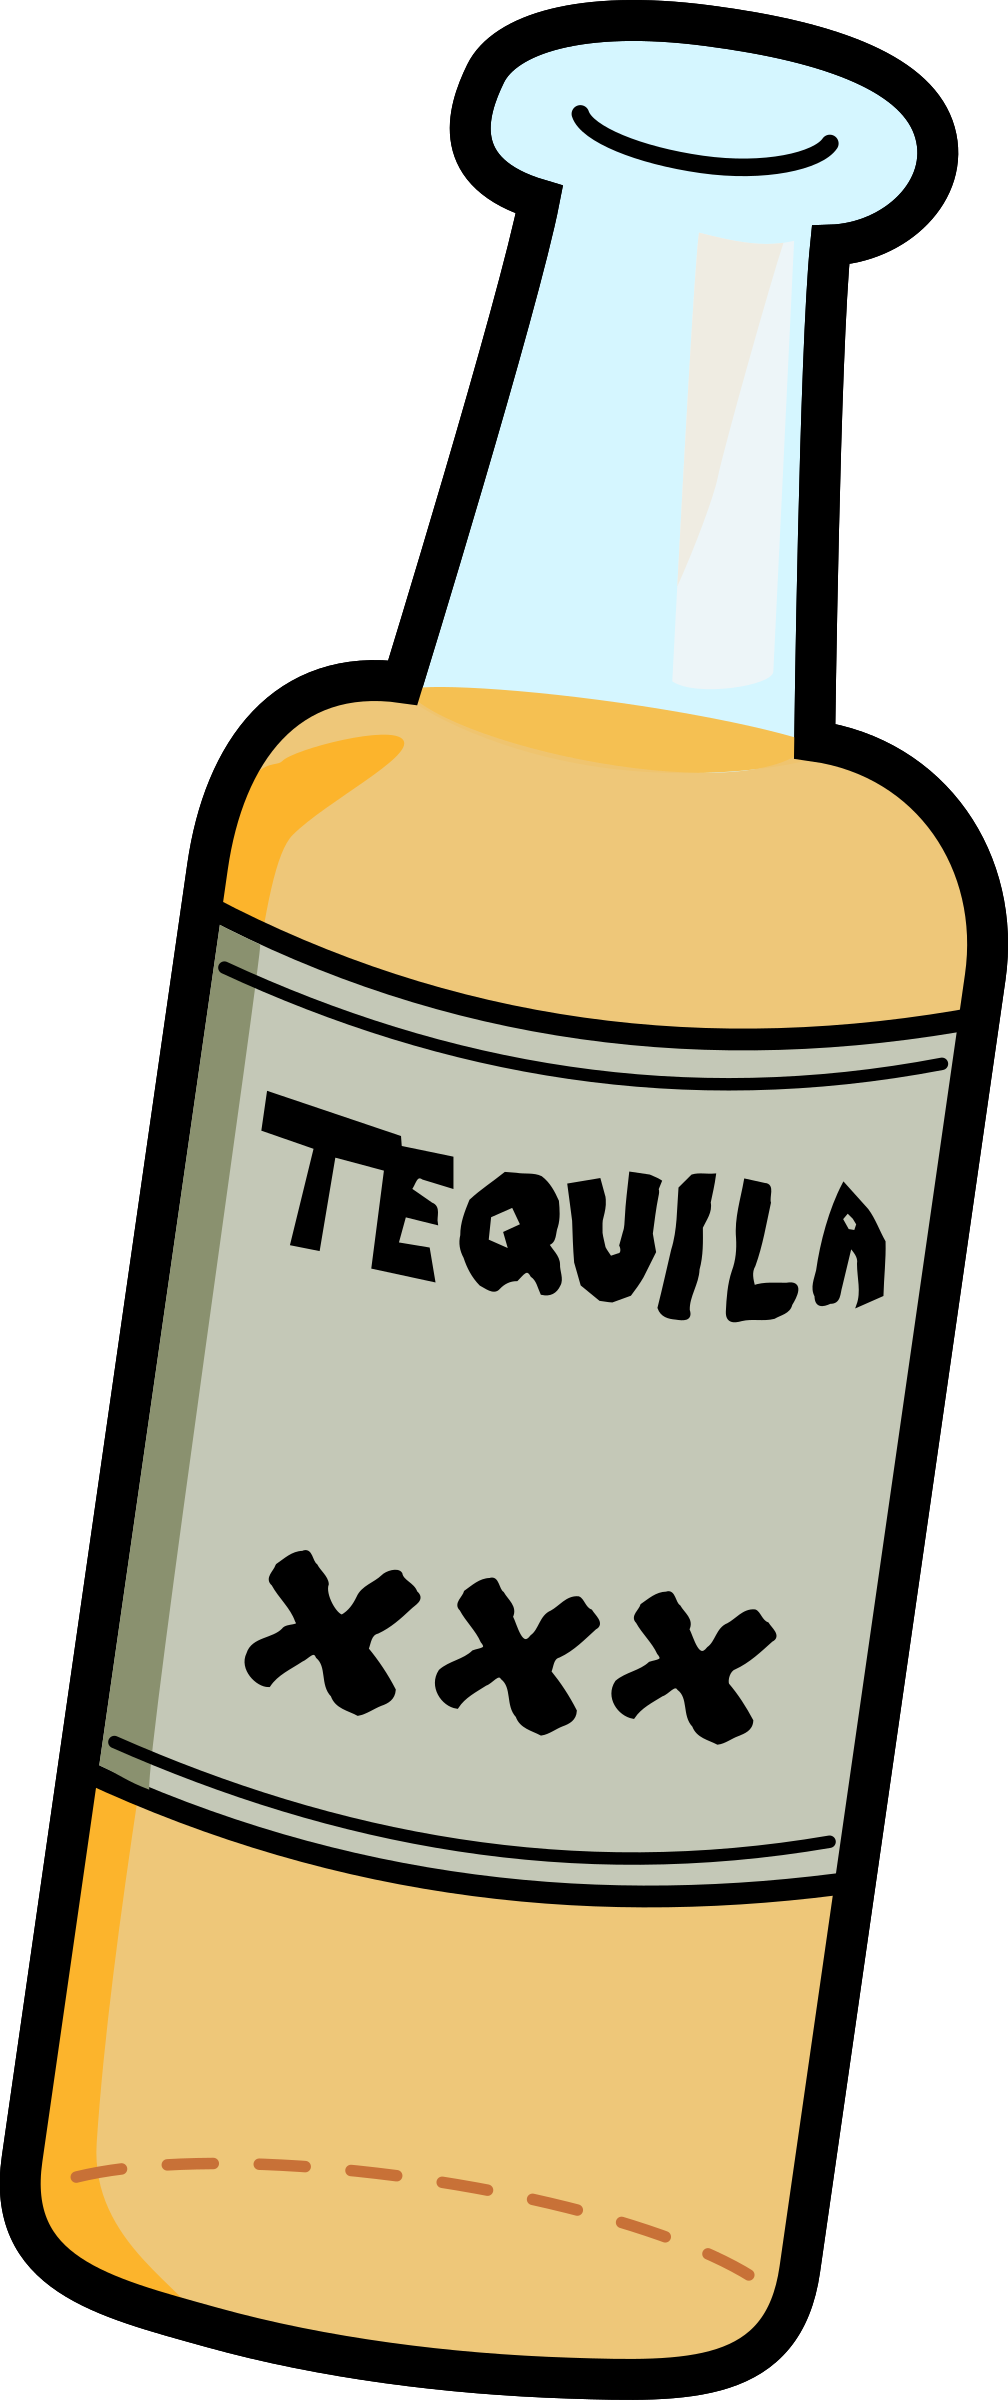 Clipart - Cartoon Tequila